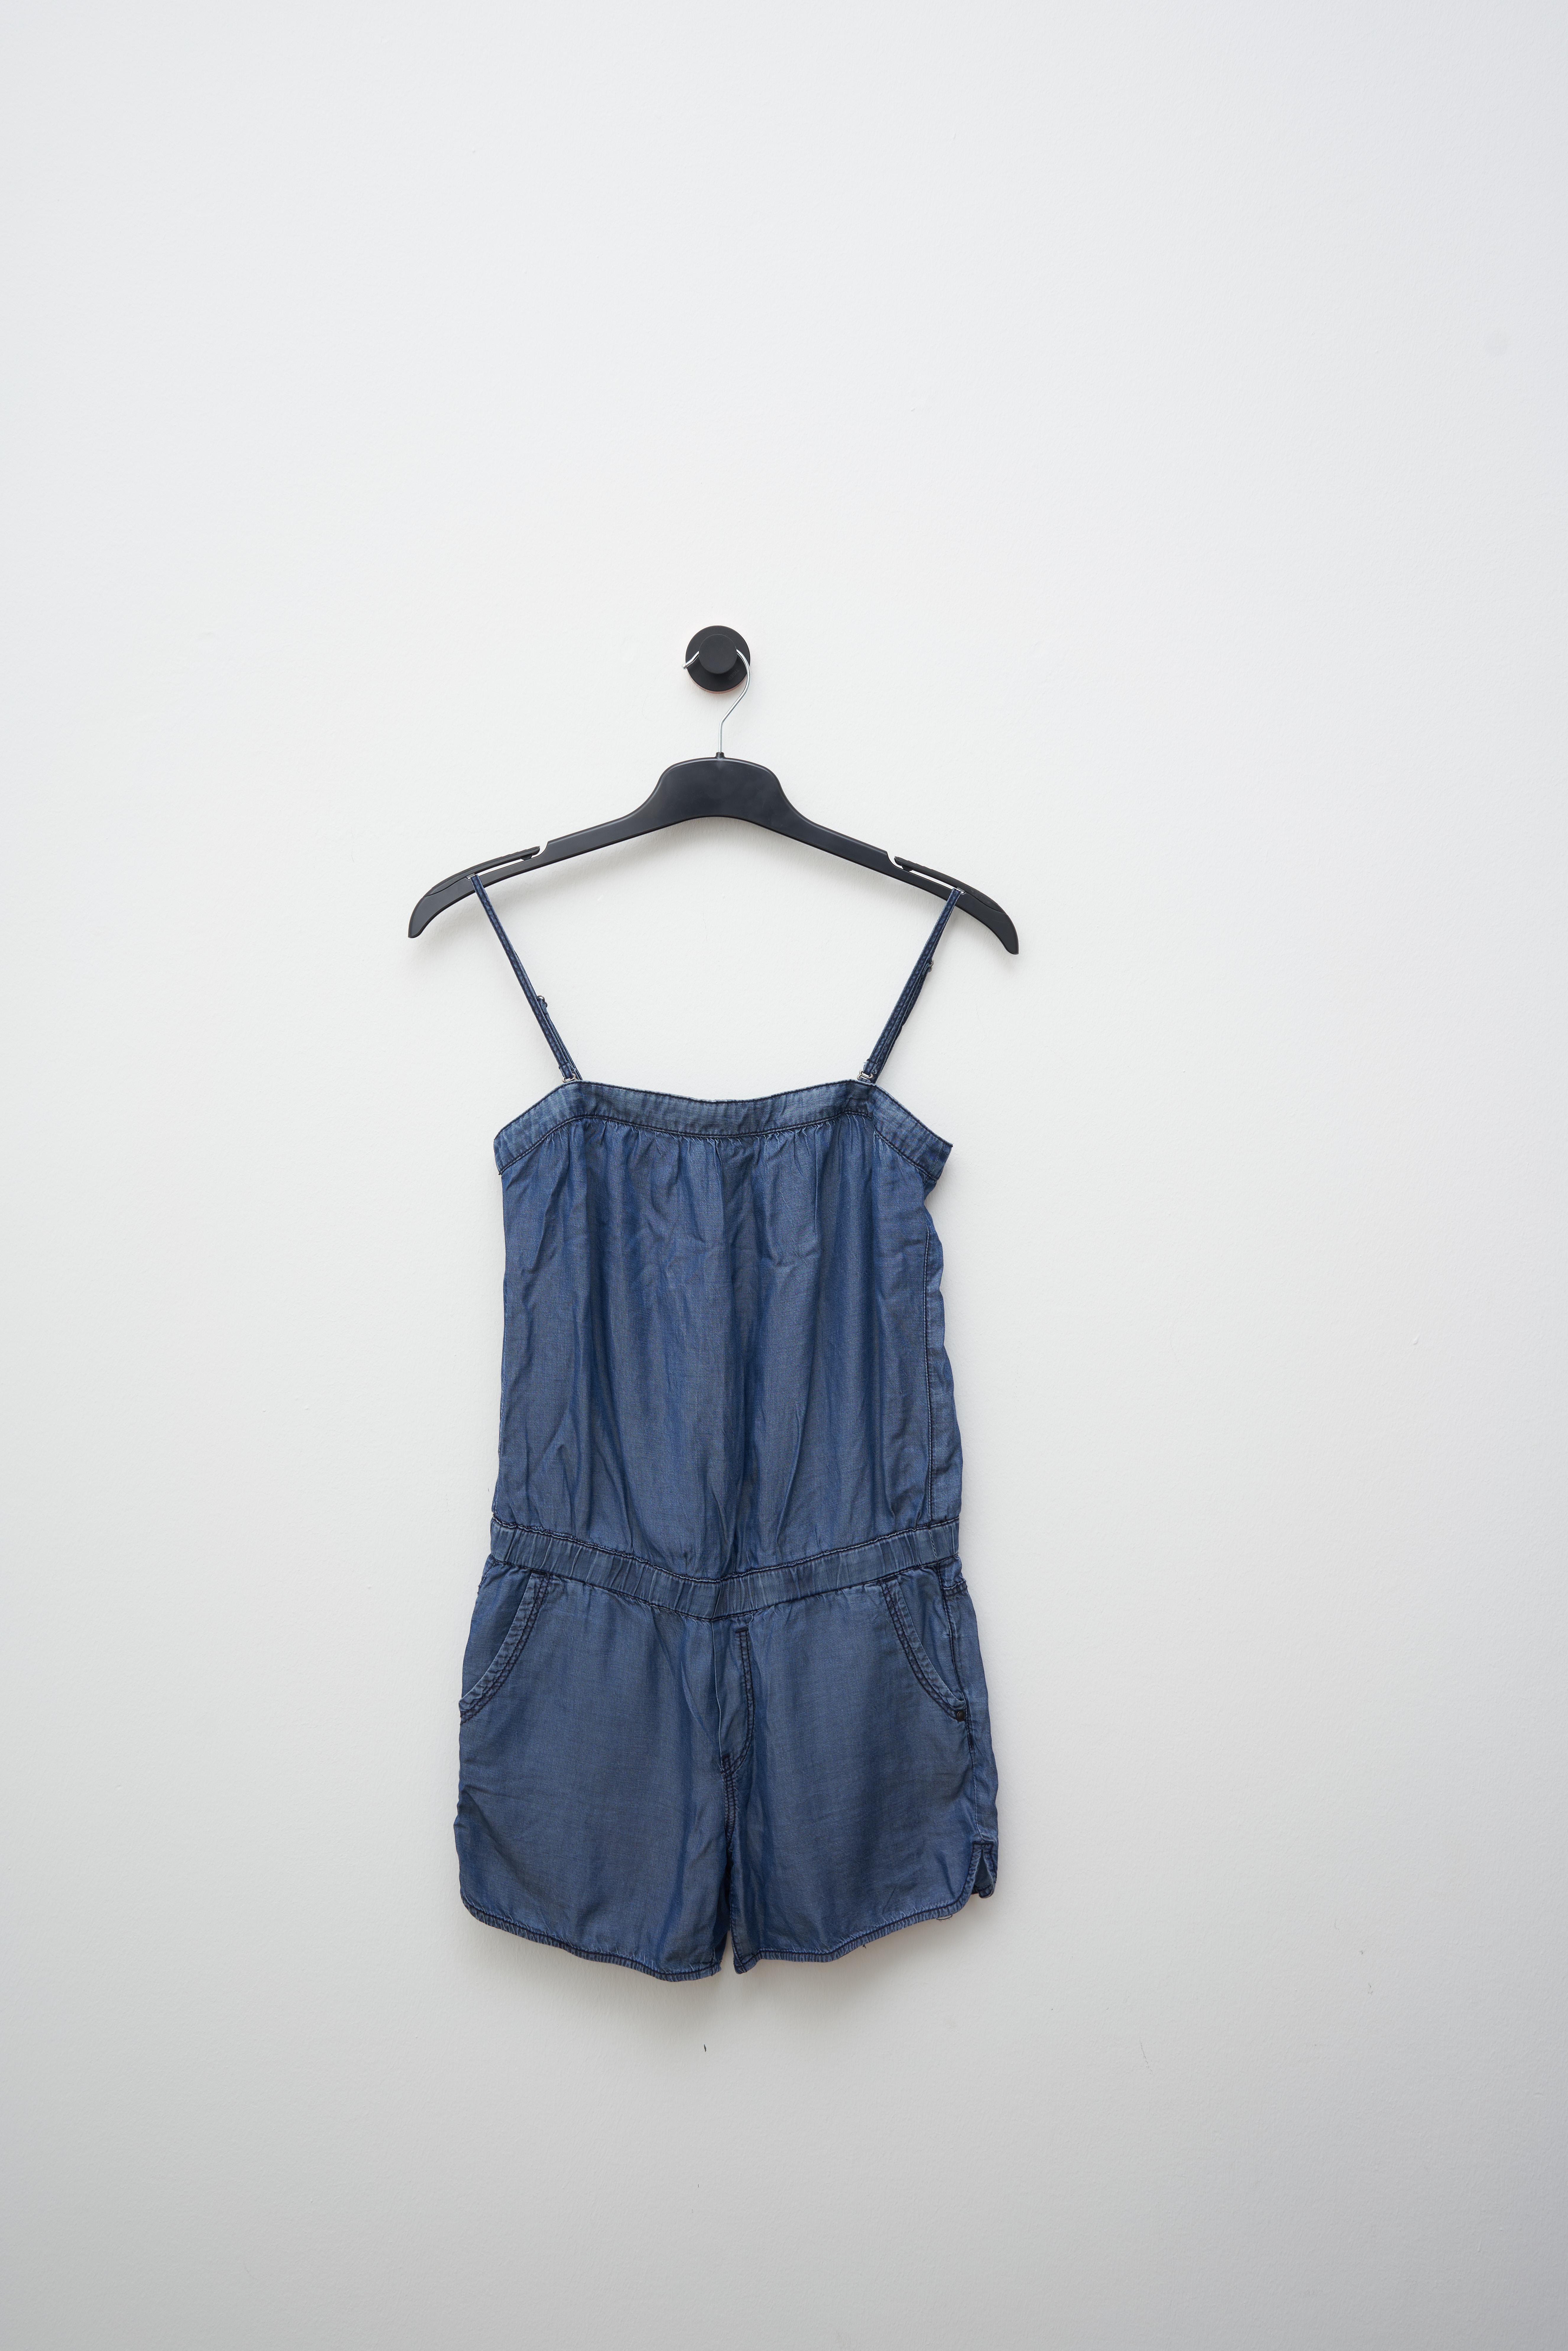 Esprit Jumpsuit / Overall Blau Gr.34